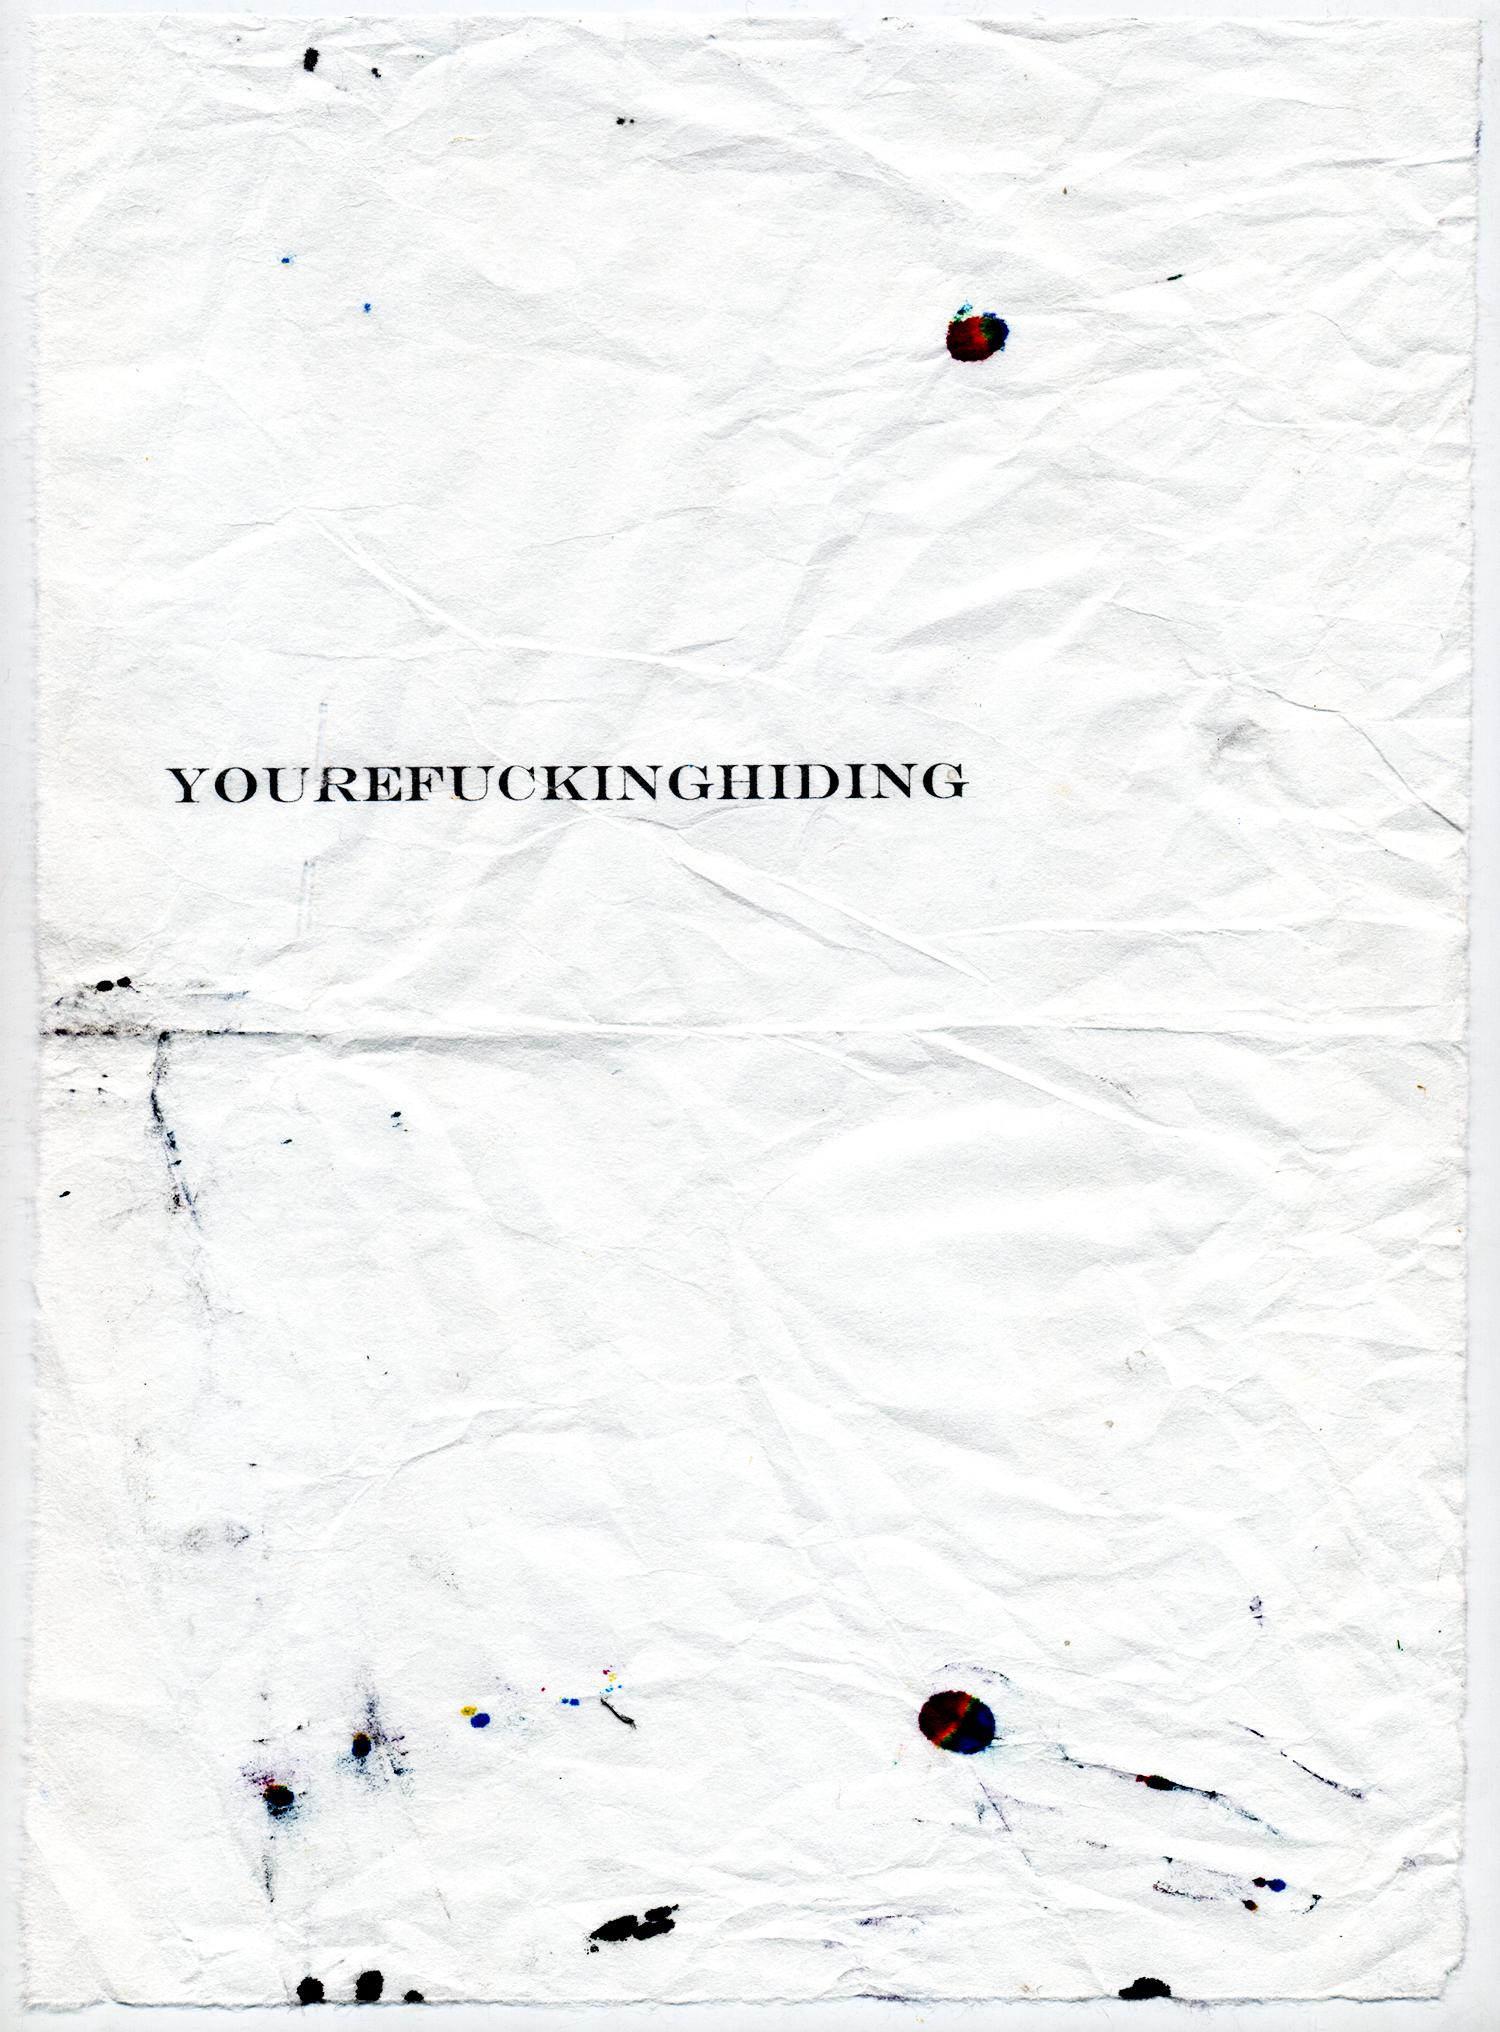 "Fucking Hiding  Digital print on mulberry, 10.5x8"", 2014"